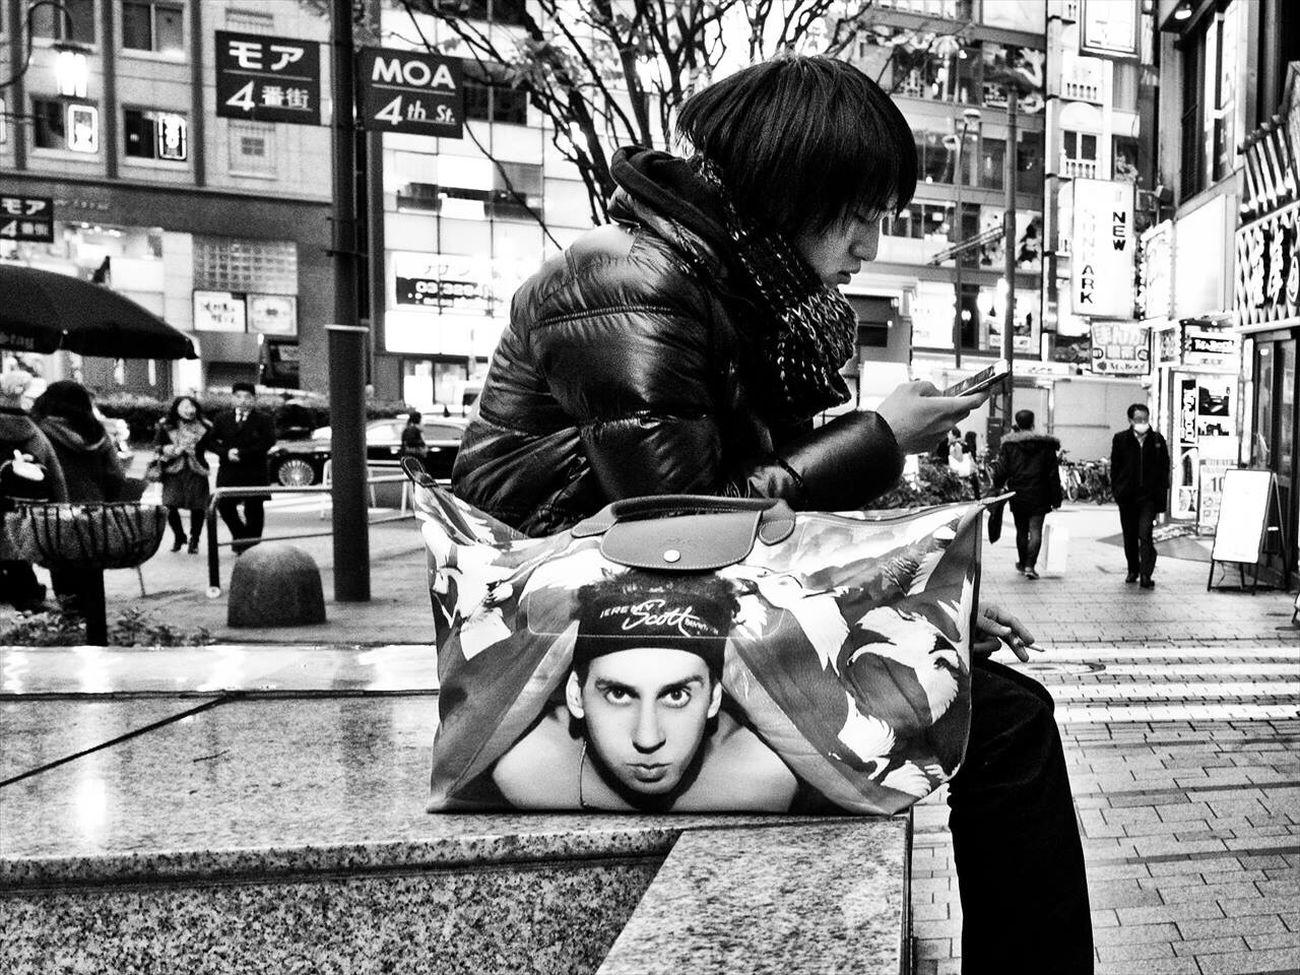 Street Streetphotographers SHINJYUKU Streetphotographer Streetphoto_bw Streetphoto Shibuya Tokyo Streetphotography Sting_the_street First Eyeem Photo